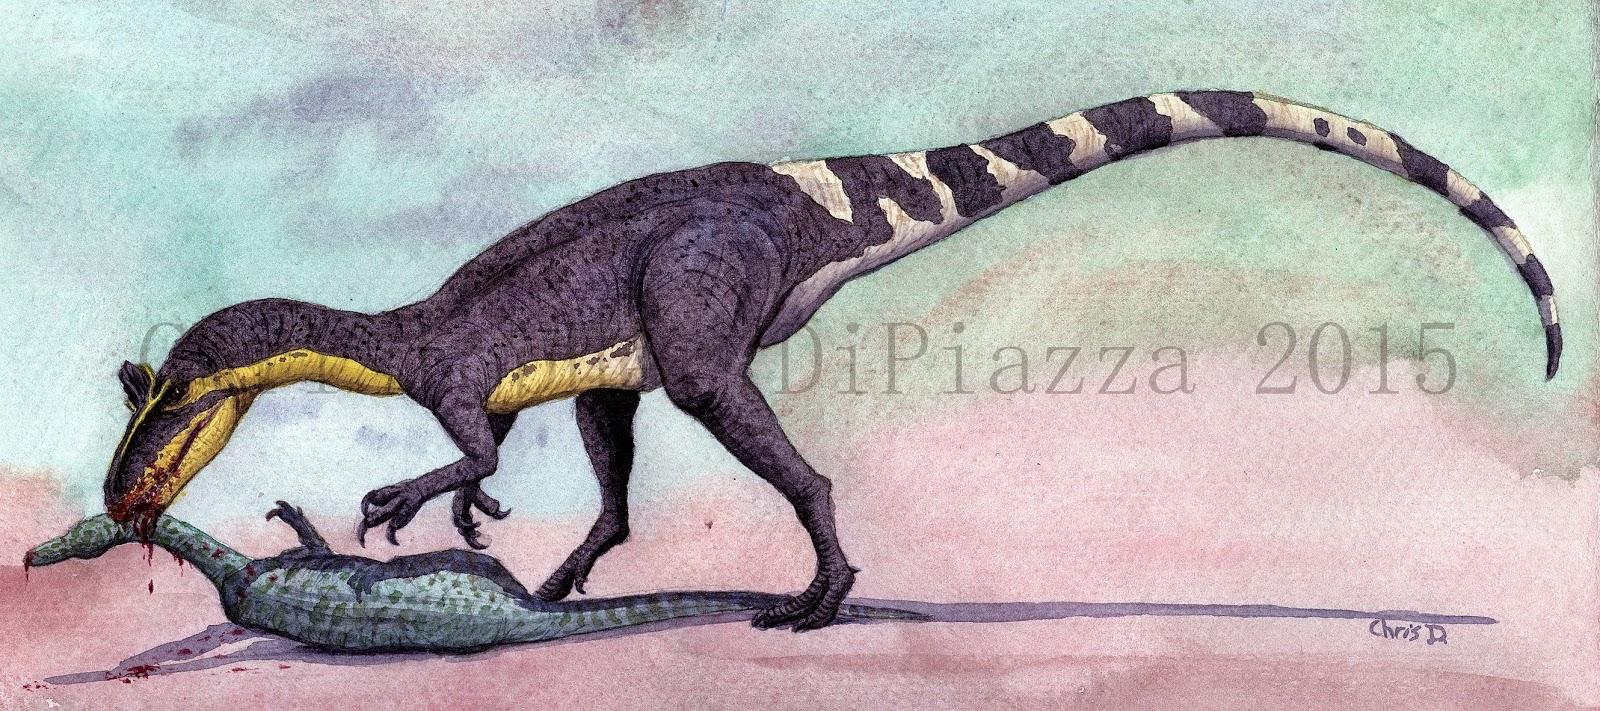 [Image: Cryolophosaurus%2B(wm).jpg]